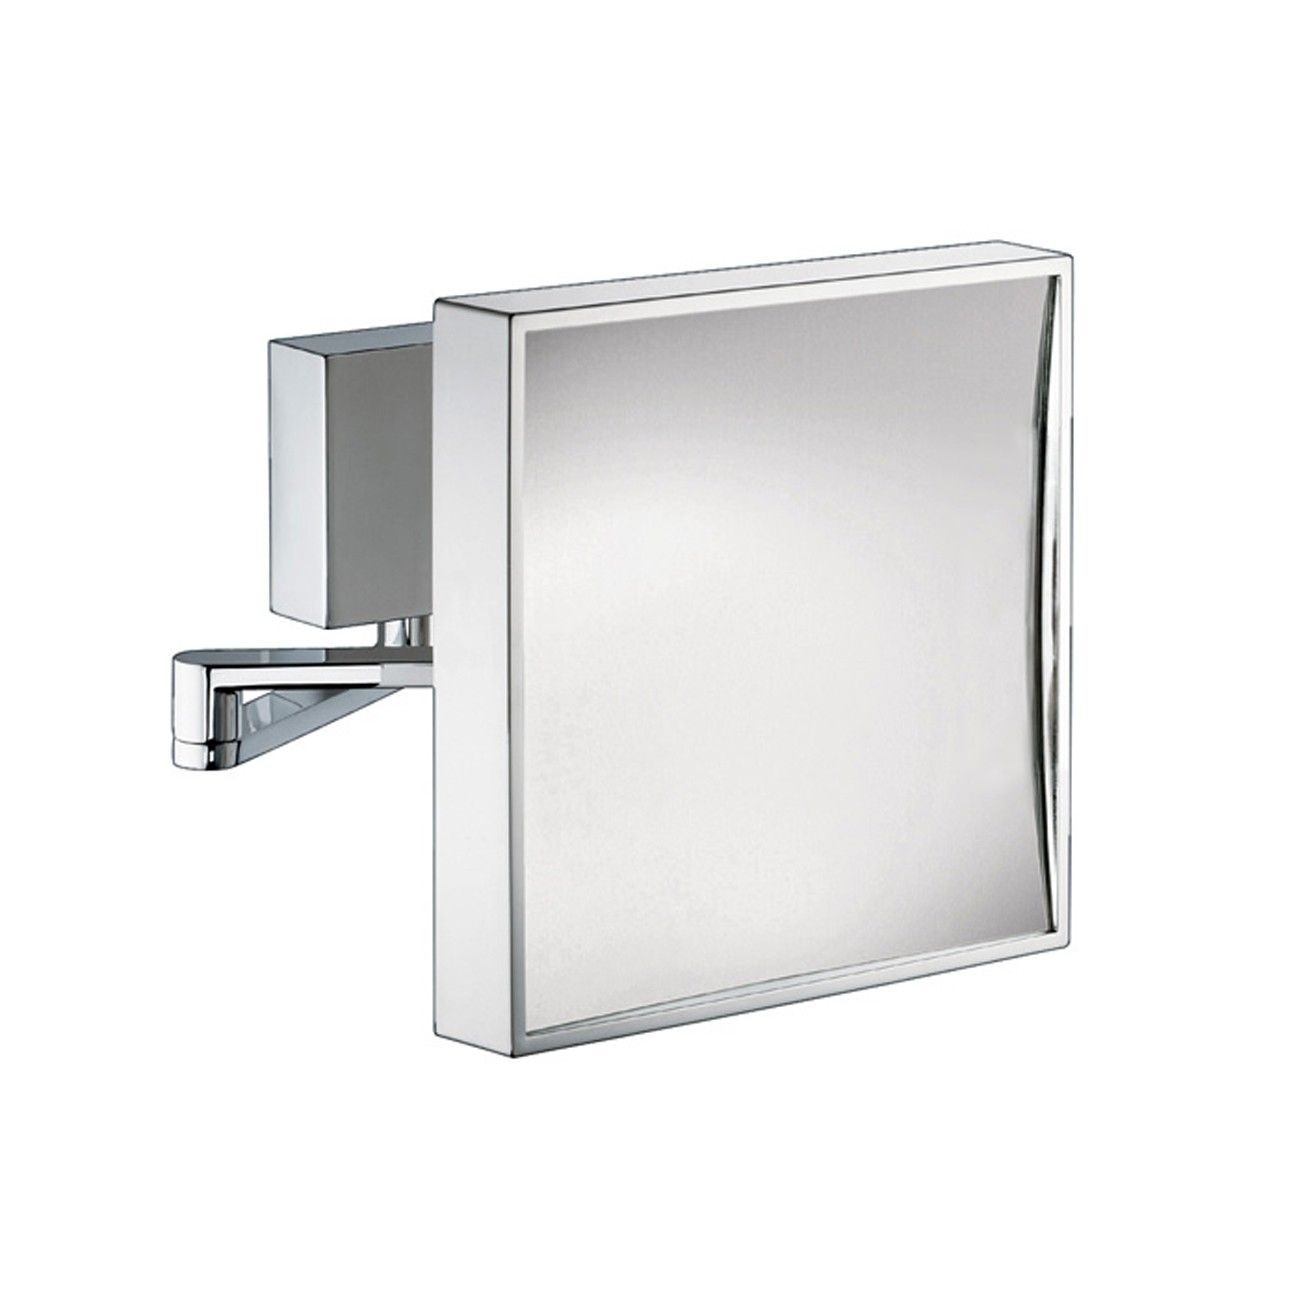 Bathroom Extendable Mirrors  Bathroom Decor  Pinterest Extraordinary Extendable Bathroom Mirror Design Ideas